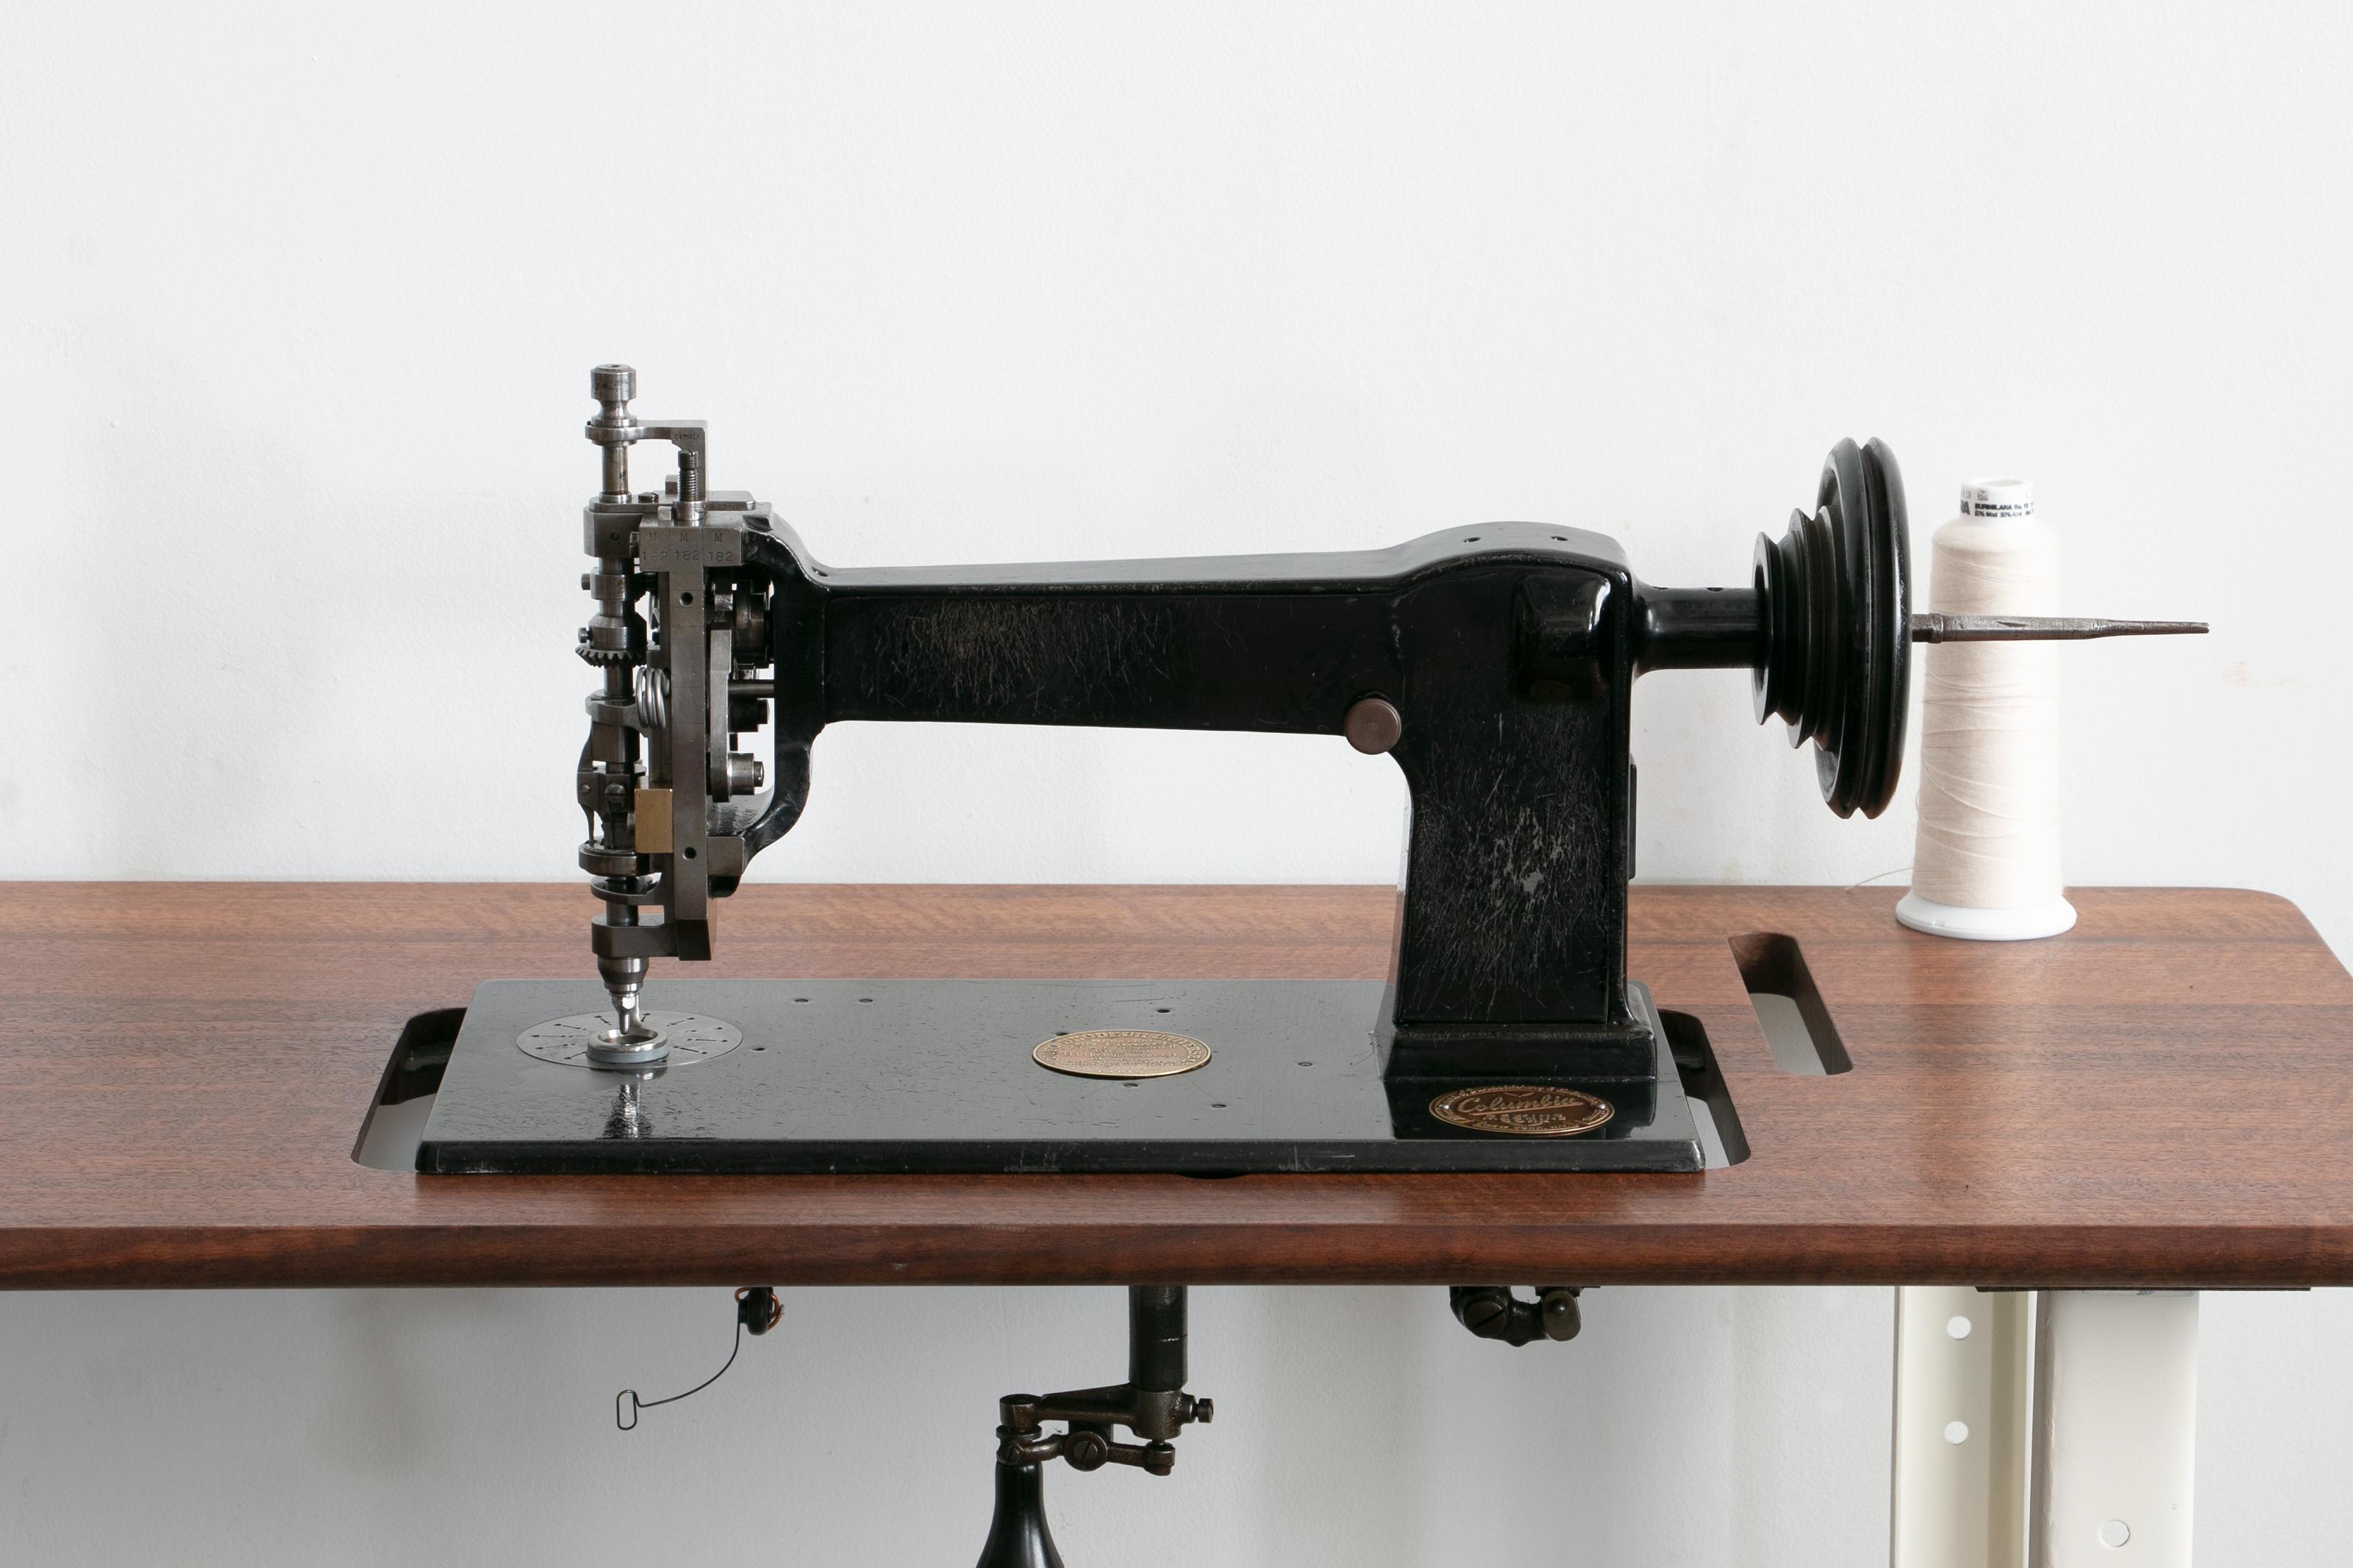 Cornely Machine A Embroidery Machine